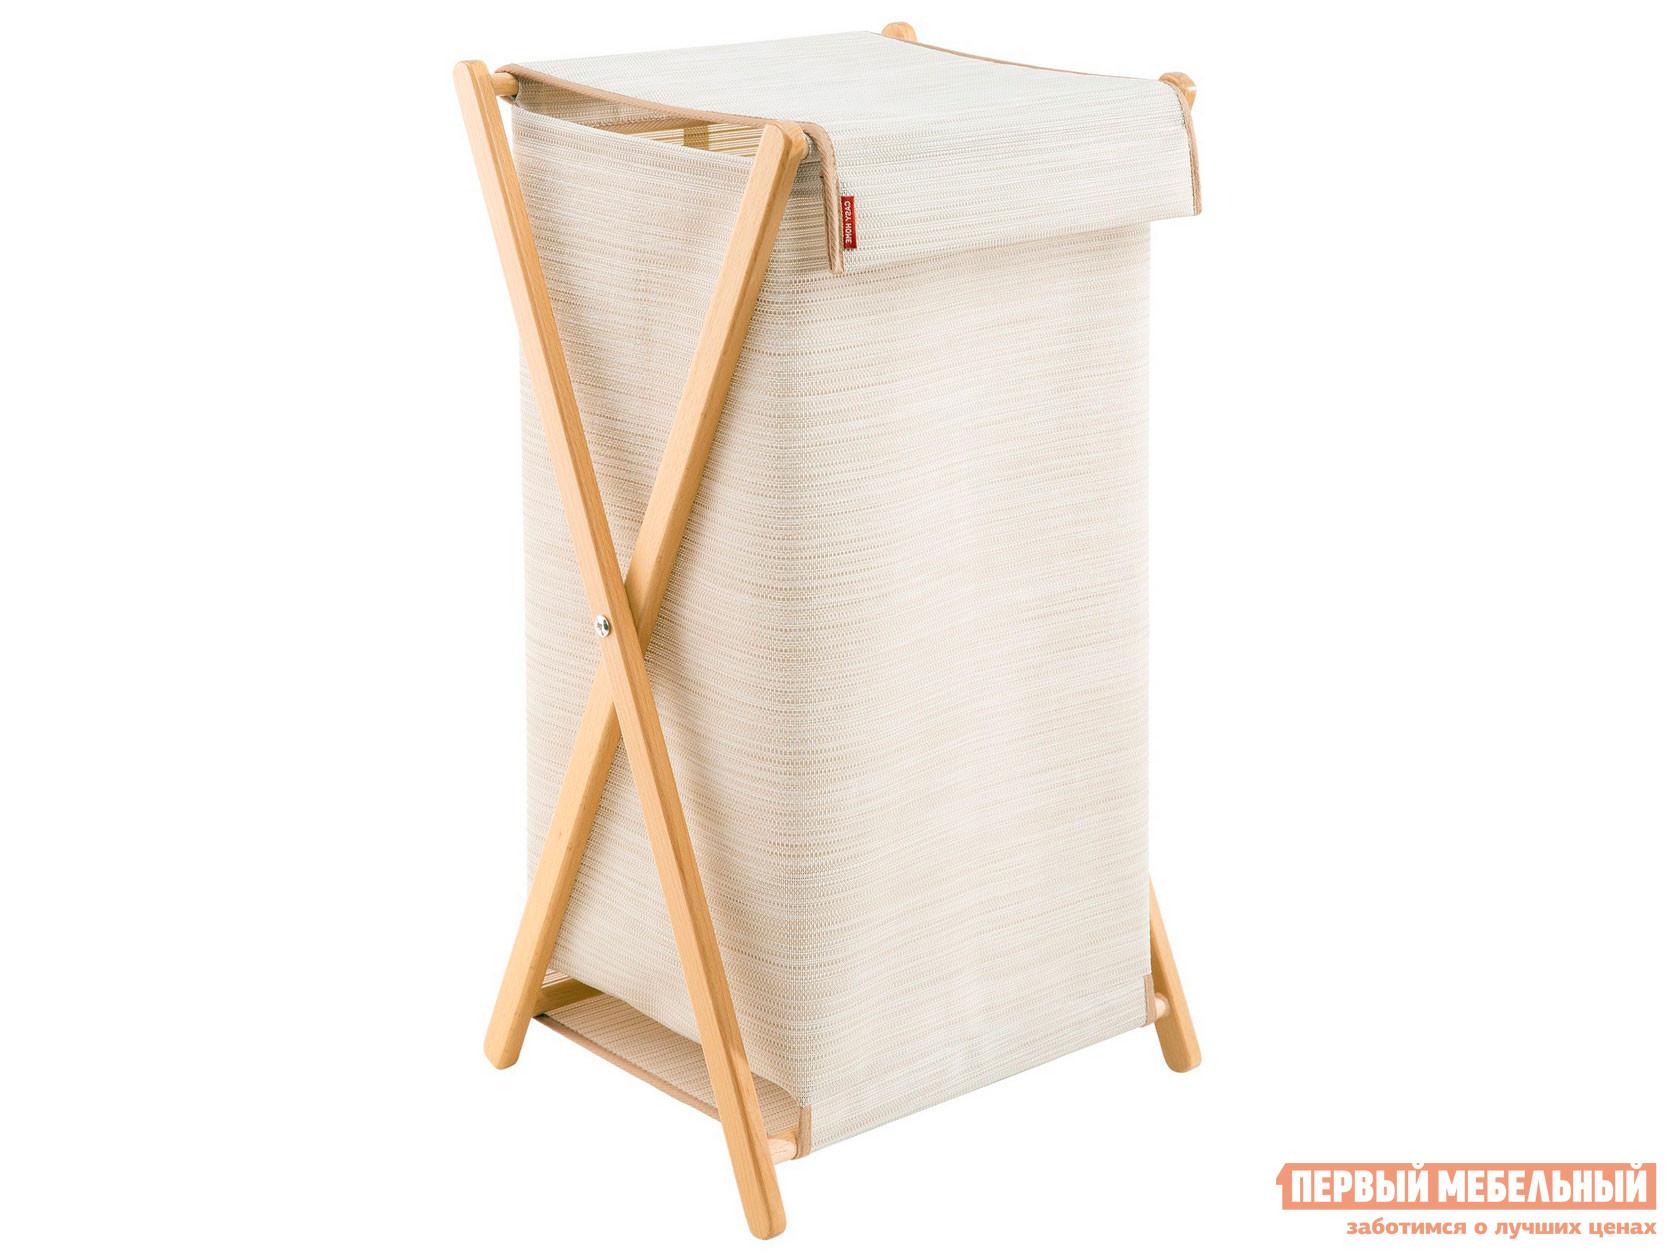 цены Корзина для белья Первый Мебельный Корзина для белья 30х25х60см